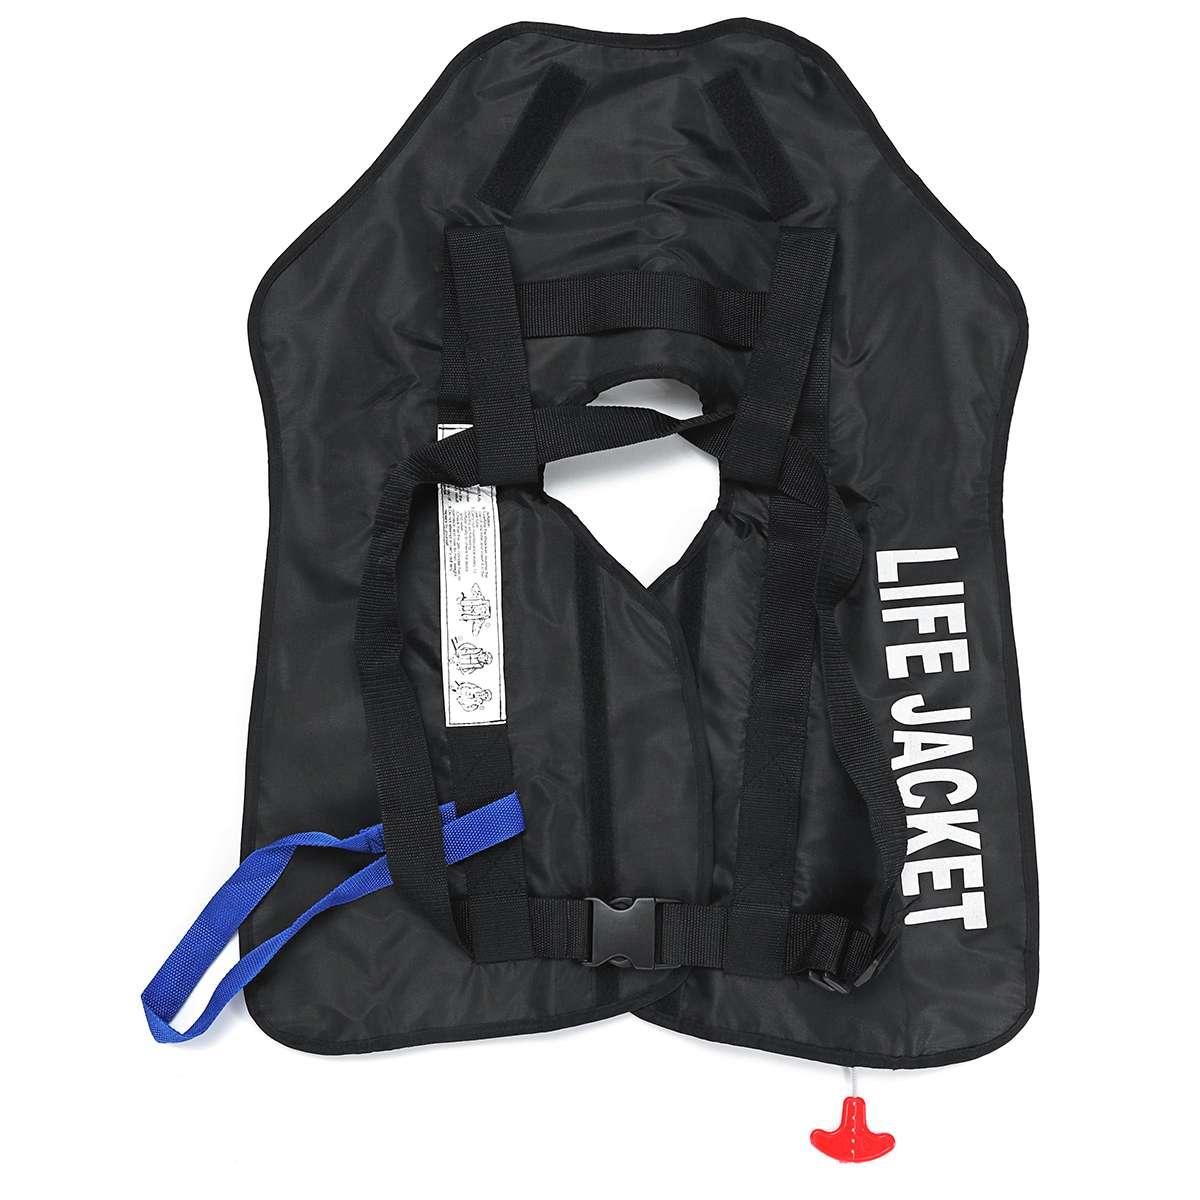 Adult Manuel Inflatable Life Jacket Vest 150N PFD Survival Flotation Universal